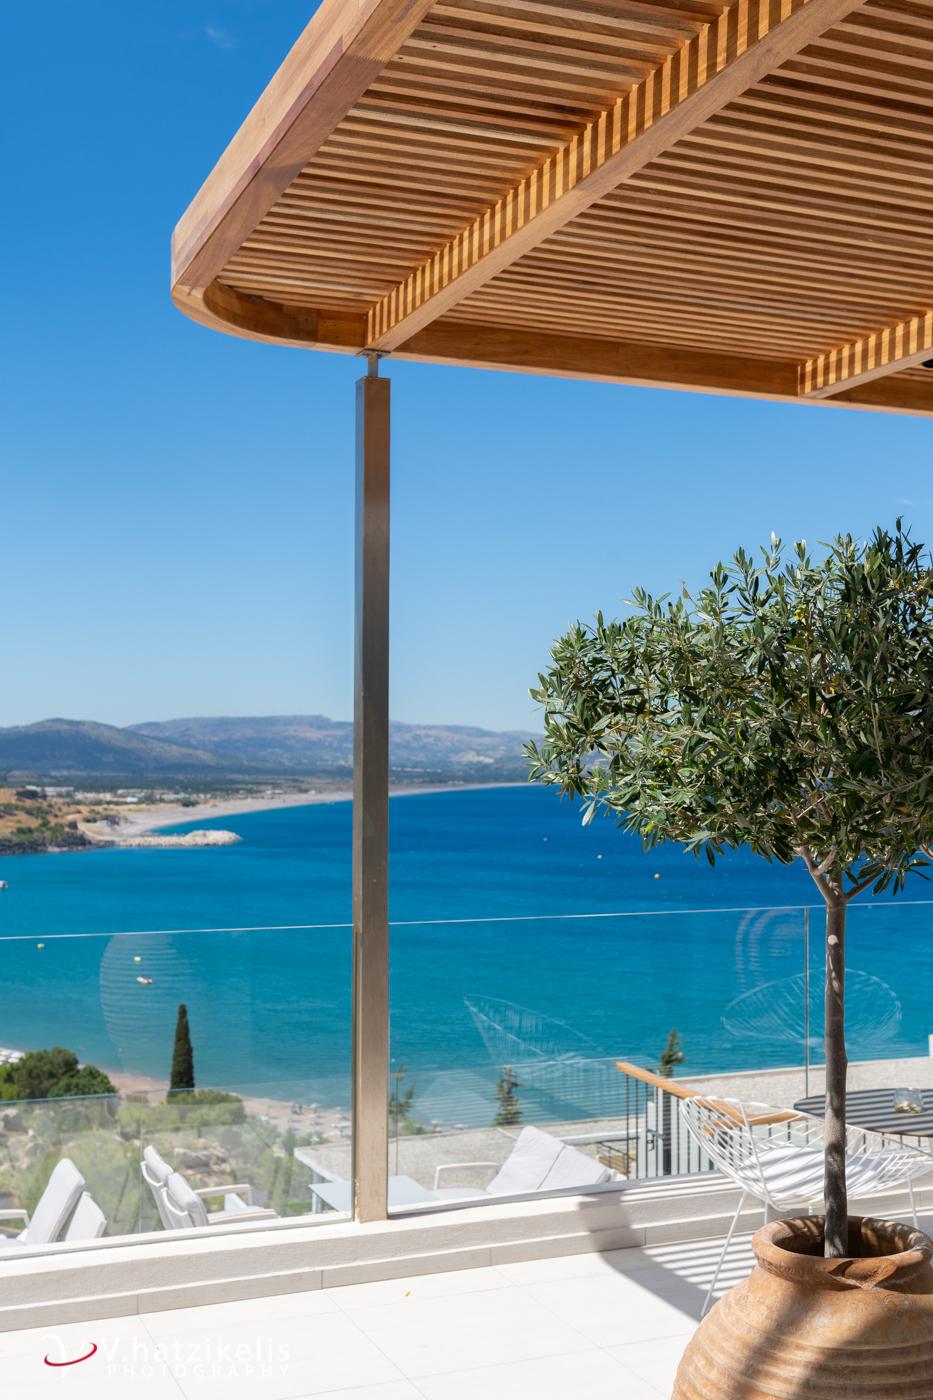 v hatzikelis photography hotel Lindos Mare Rhodes-7